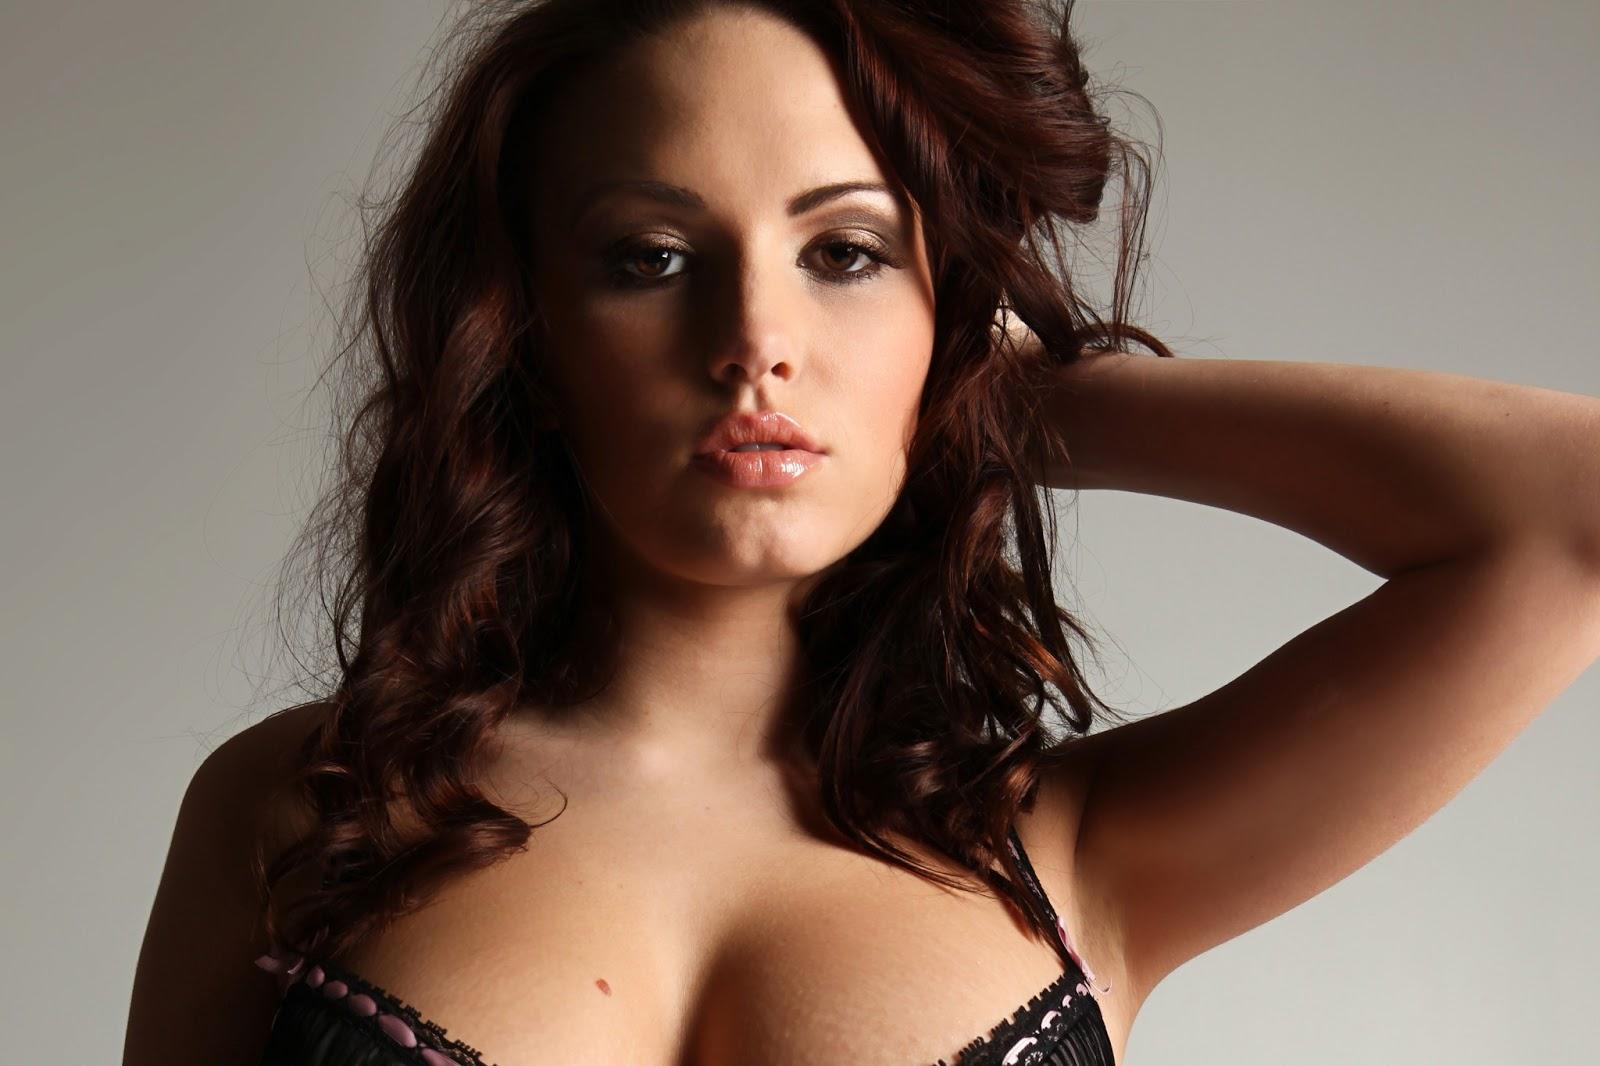 Tits Janova Nude Model Pic